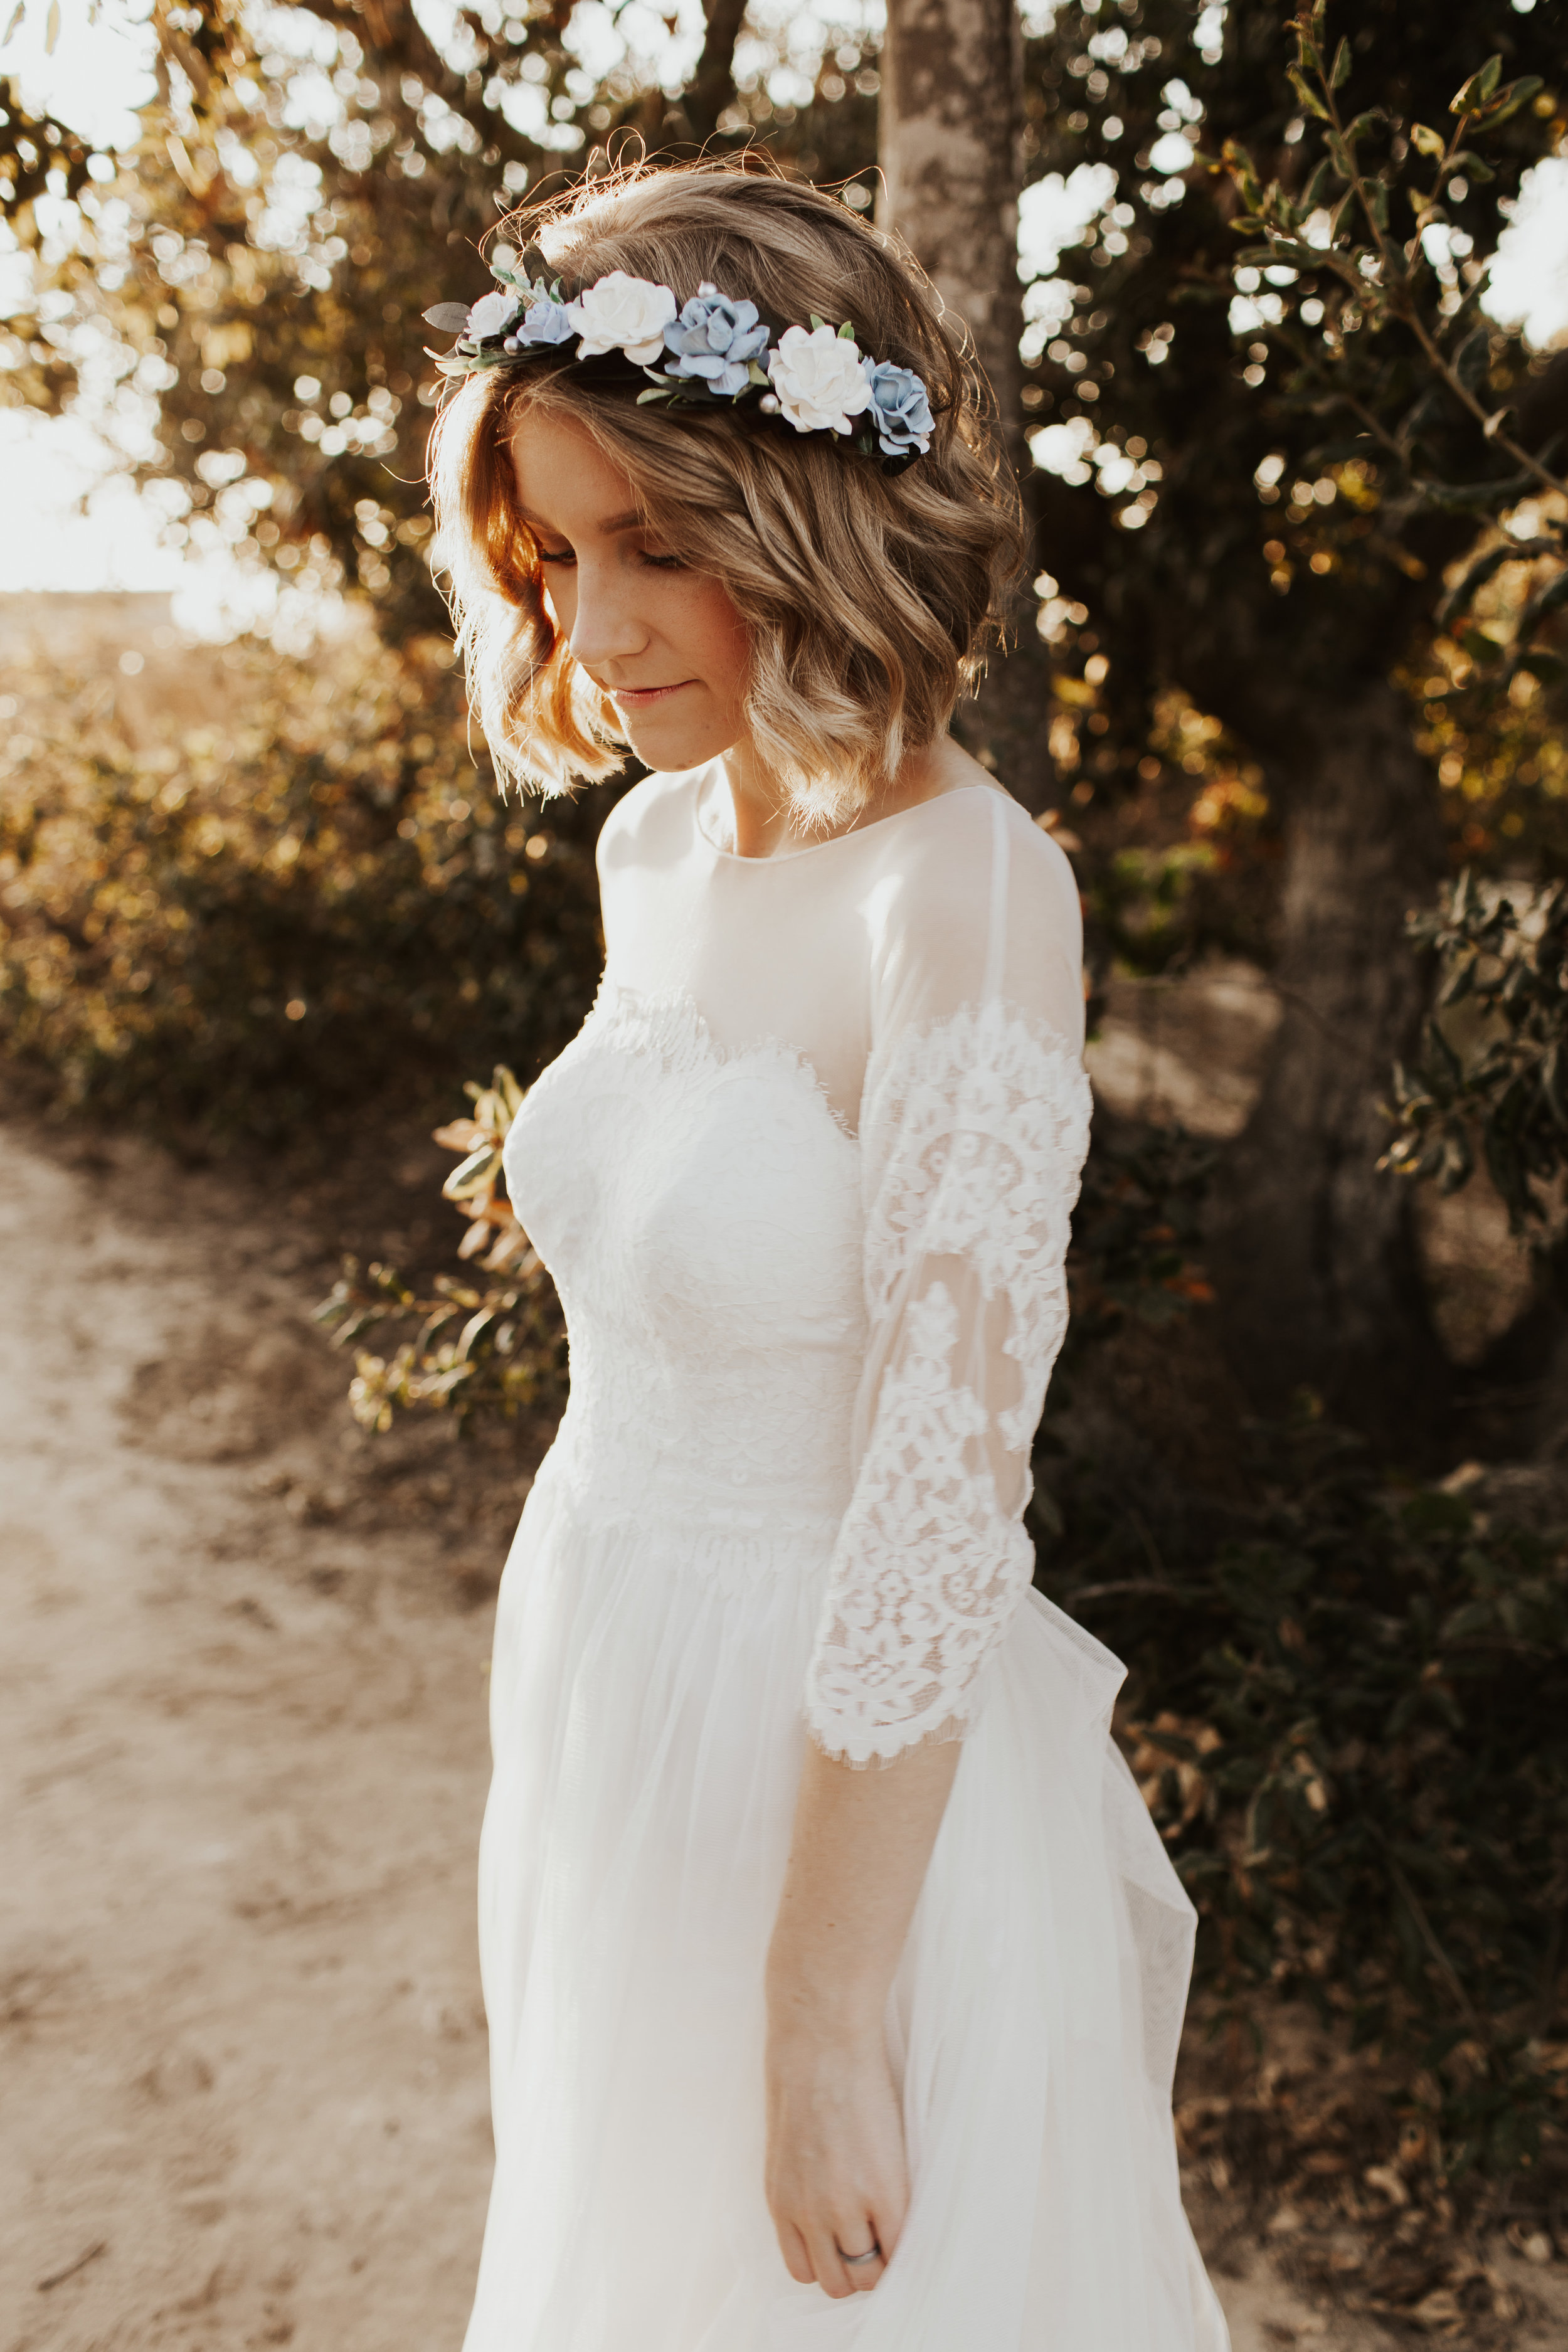 Jessie-Noah-Top-of-the-World-Laguna-Beach-Elopement-Bridal-Wedding-Session-FINISHED-20.jpg